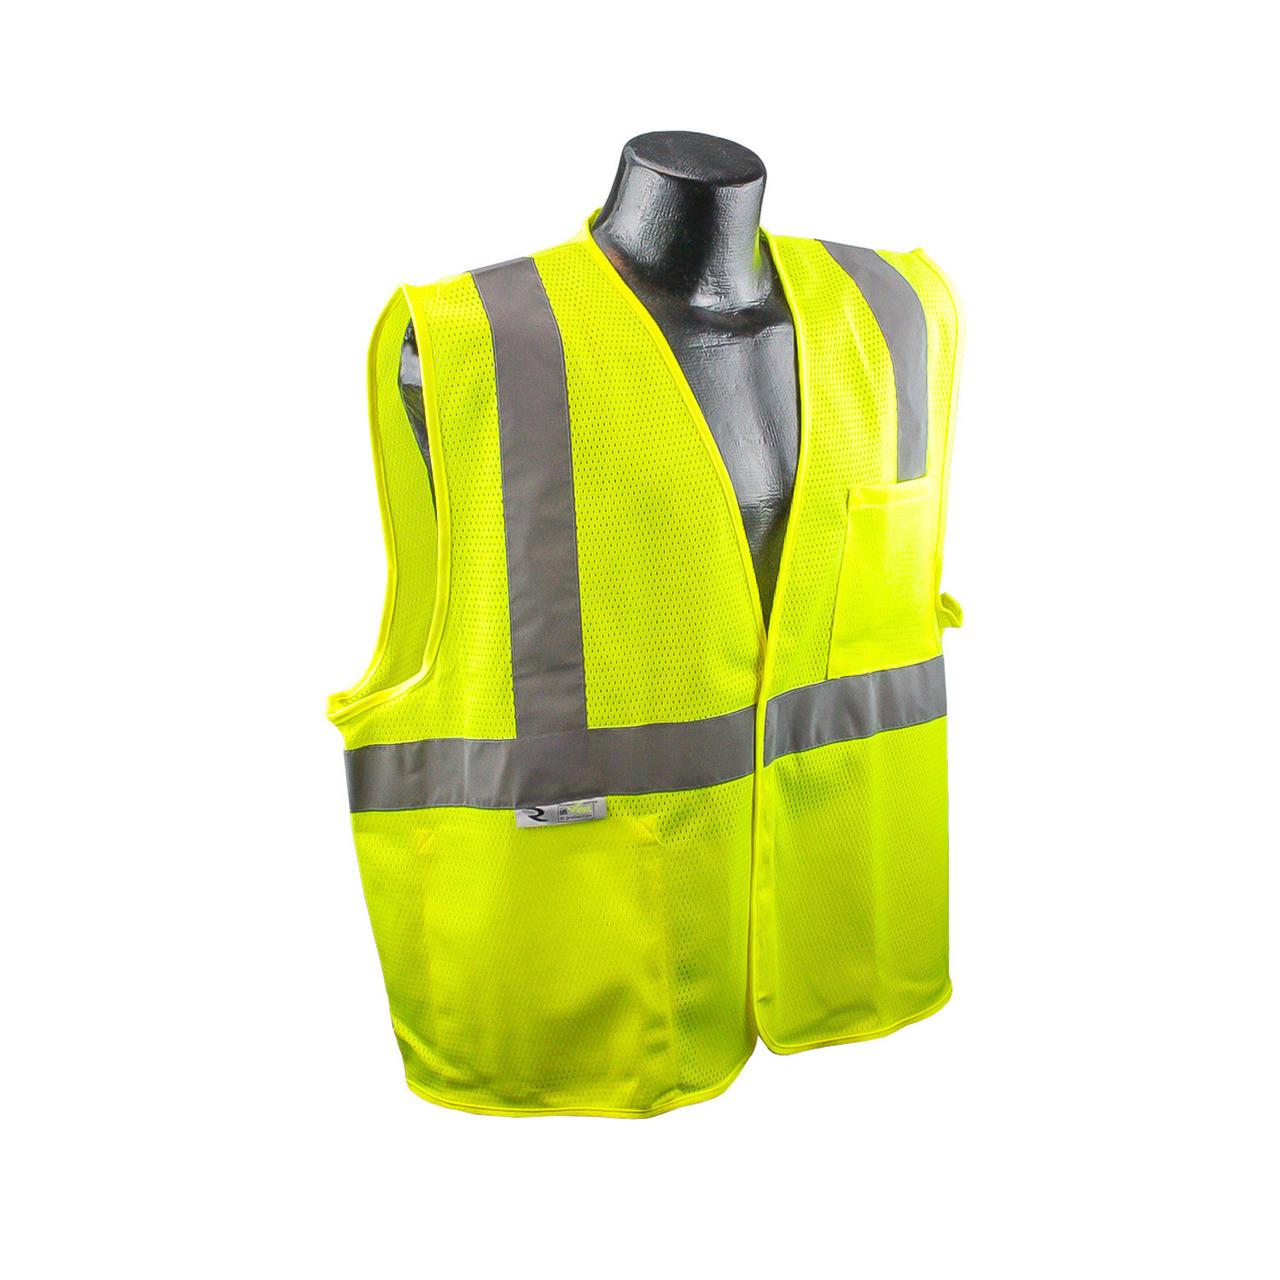 SV2 - Economy Class 2 Safety Vest Front Safety Green